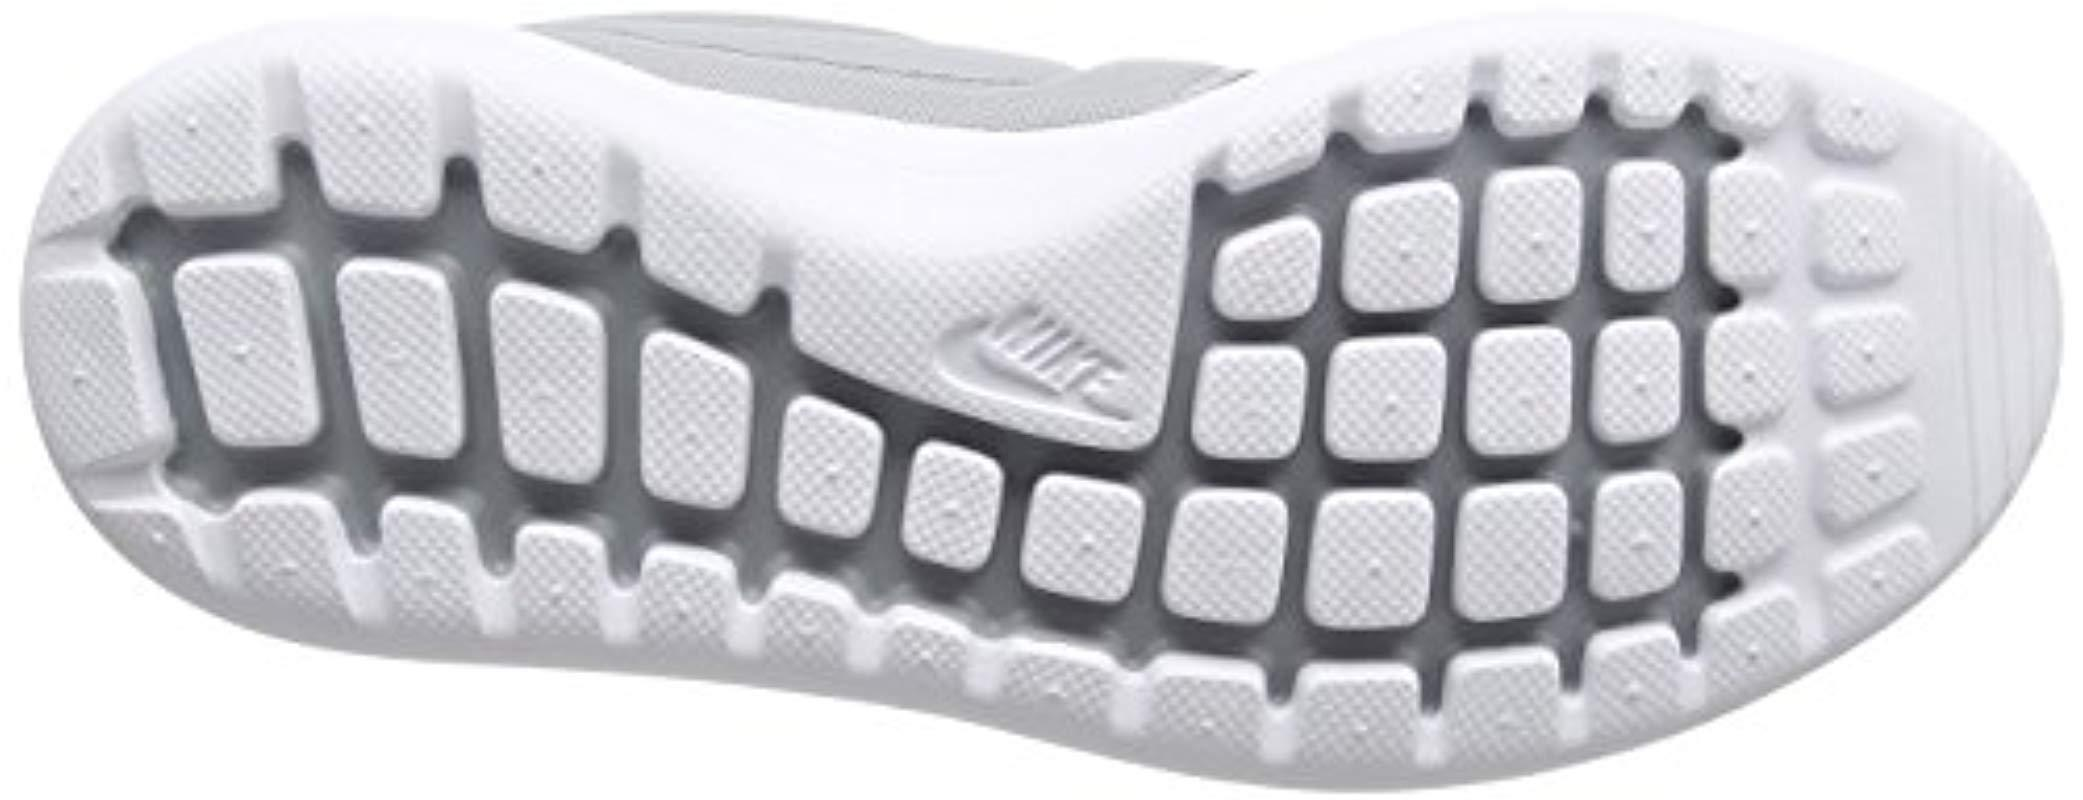 5c8bf5c2b3fc7 Nike - Gray 844931-001 Fitness Shoes - Lyst. View fullscreen